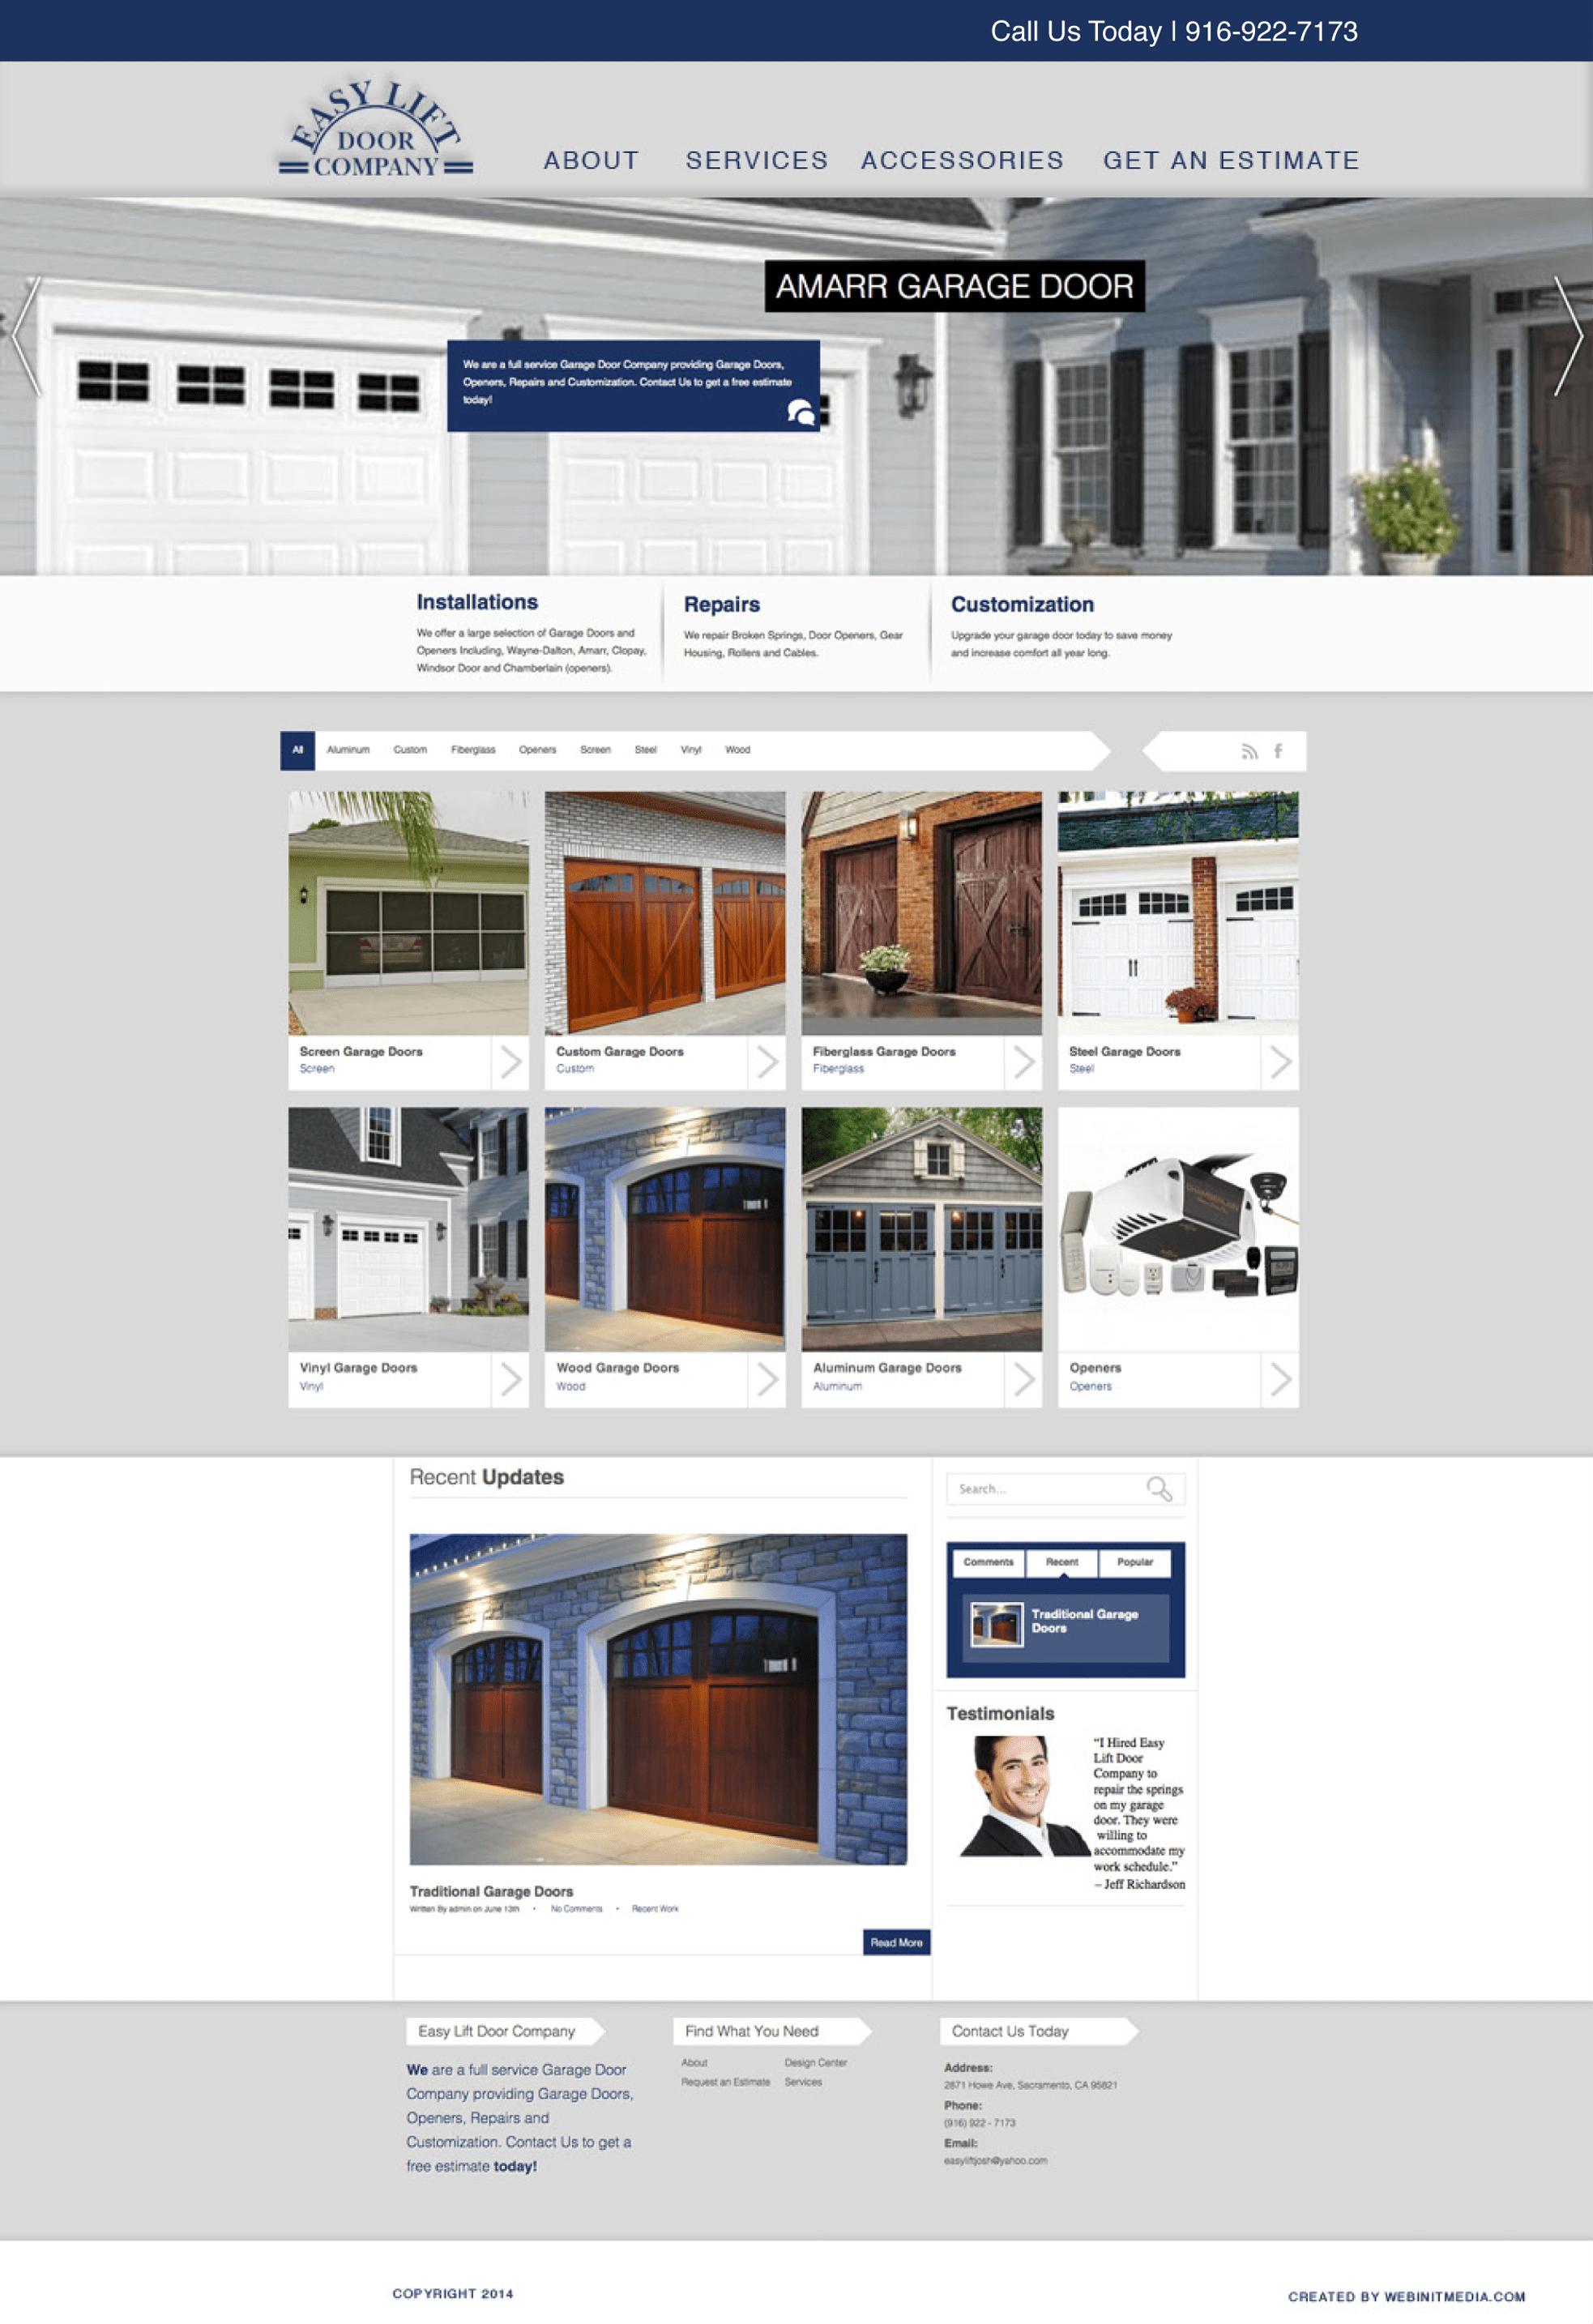 New Website Design  sc 1 st  Webinet Media & Easy Lift Door Company - Webinet Media